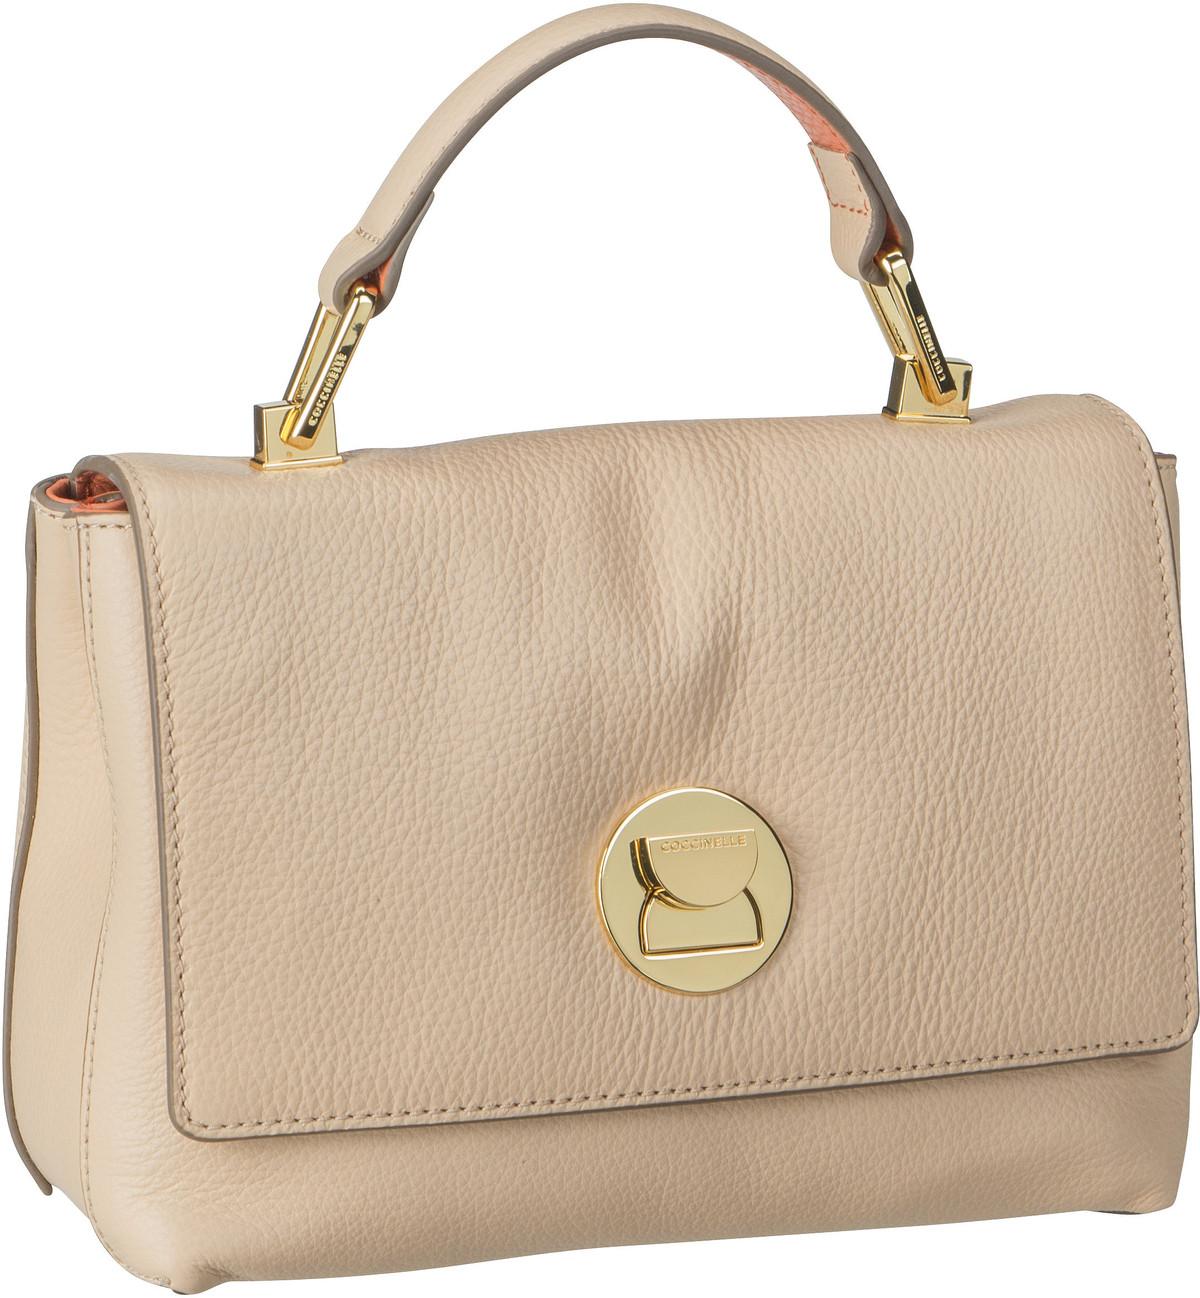 Handtasche Liya 5840 Nude/Peach